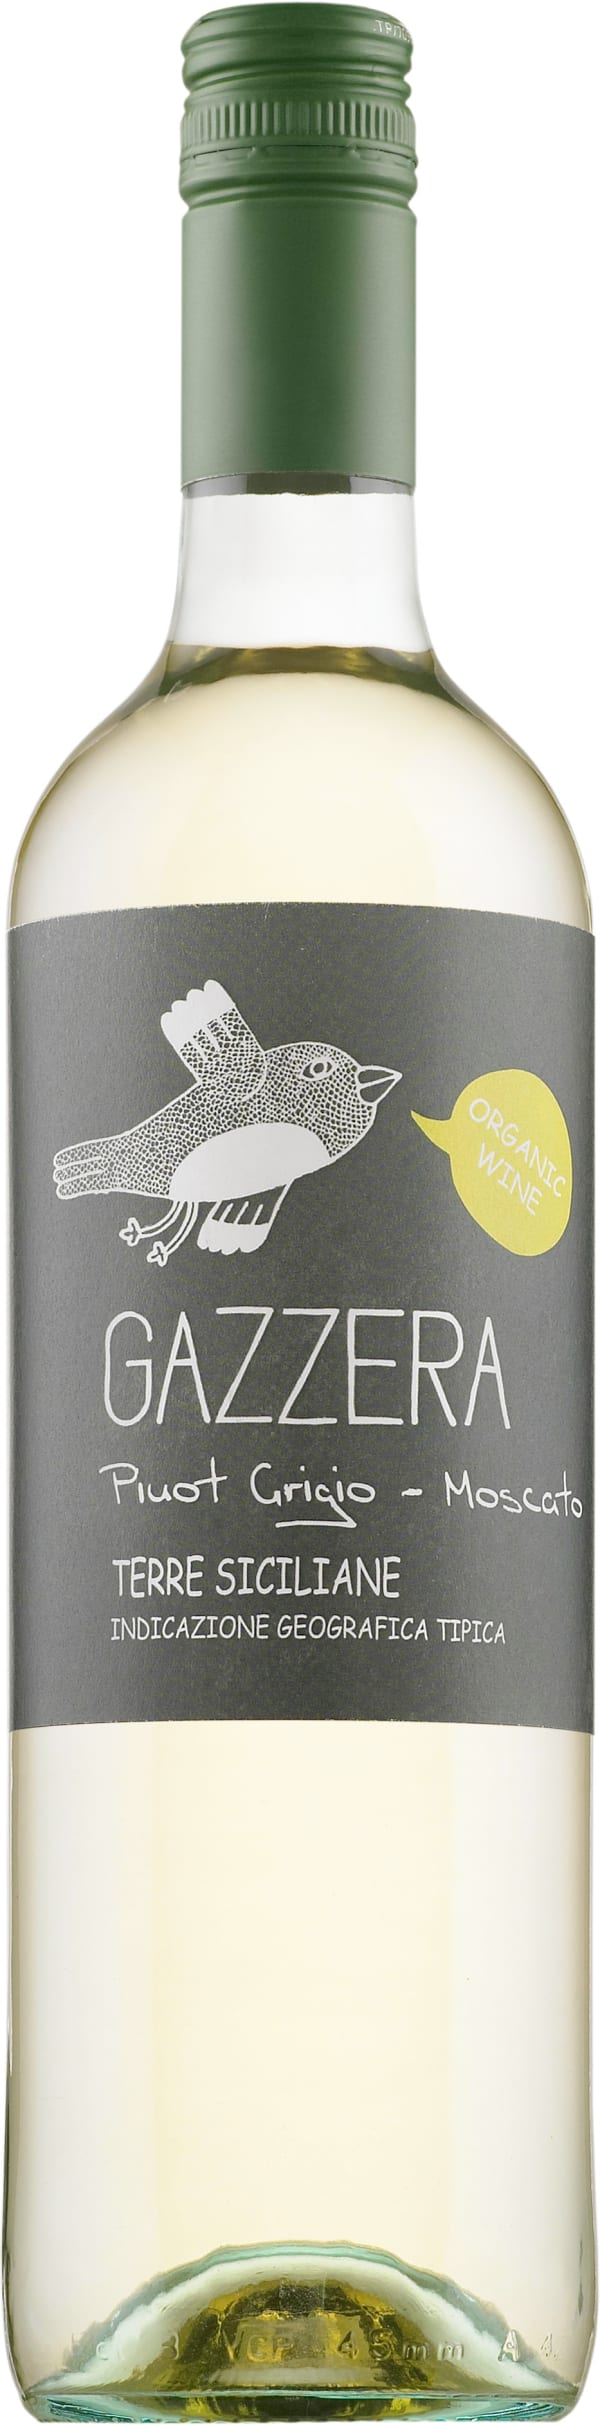 Gazzera Pinot Grigio Moscato Organic 2018